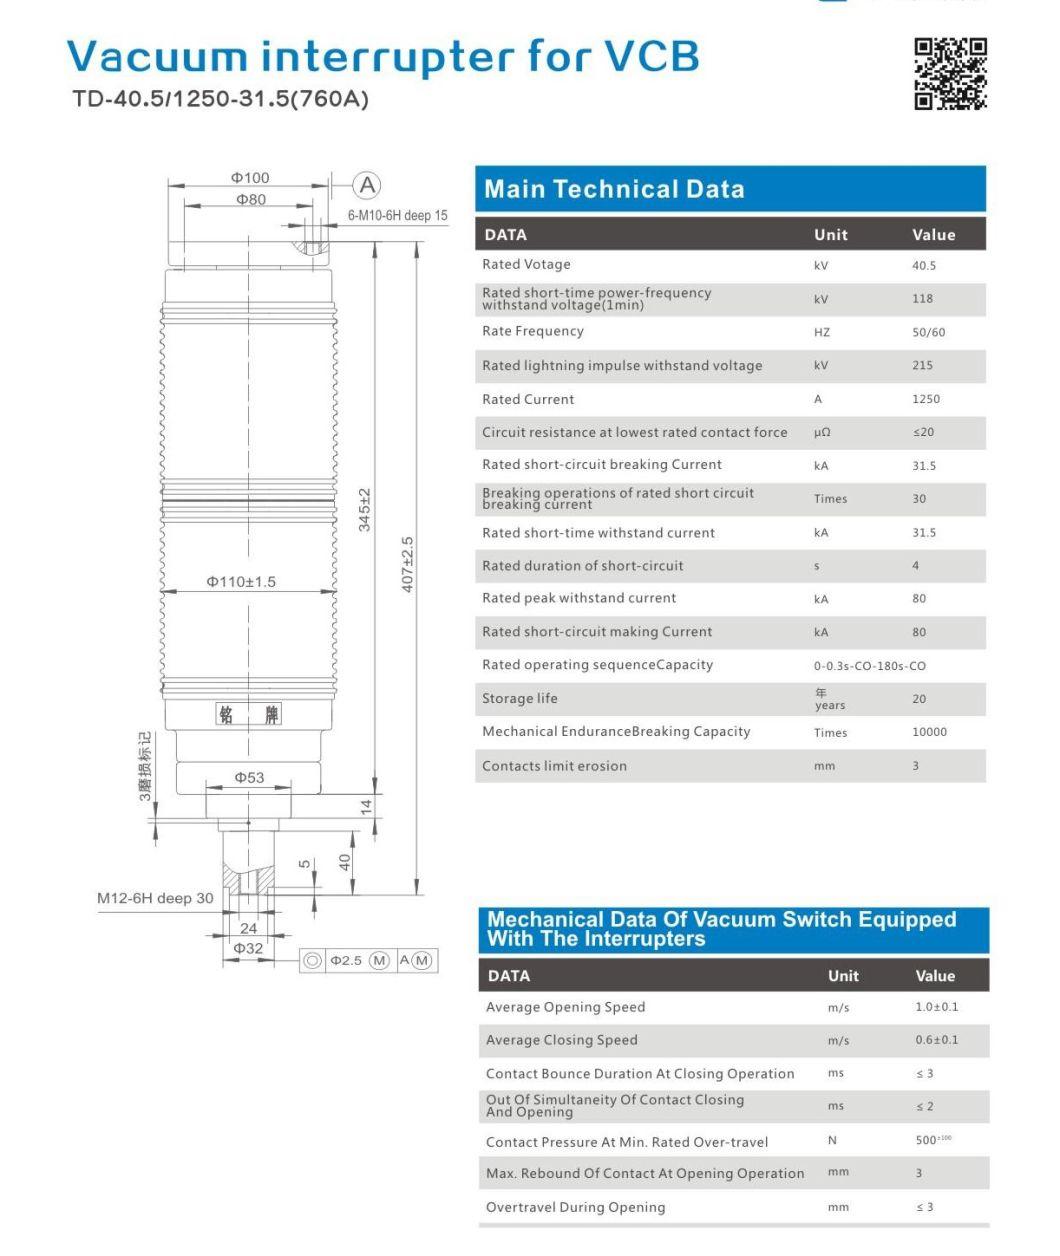 Vacuum Interrupter for Vcb Td-40.5/1250-31.5 (760A)